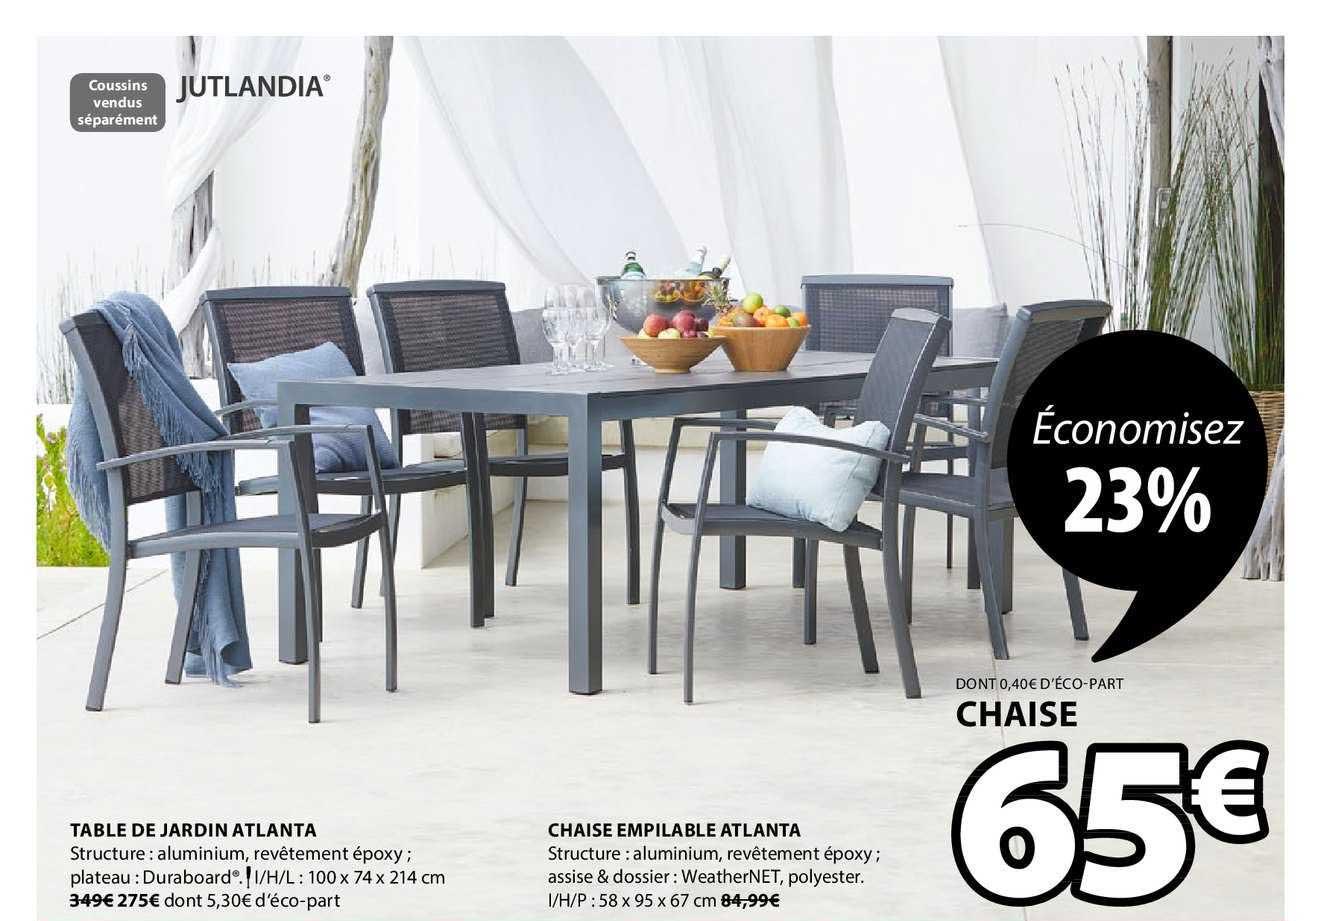 JYSK Table De Jardin Atlanta Chaise Empilable Atlanta